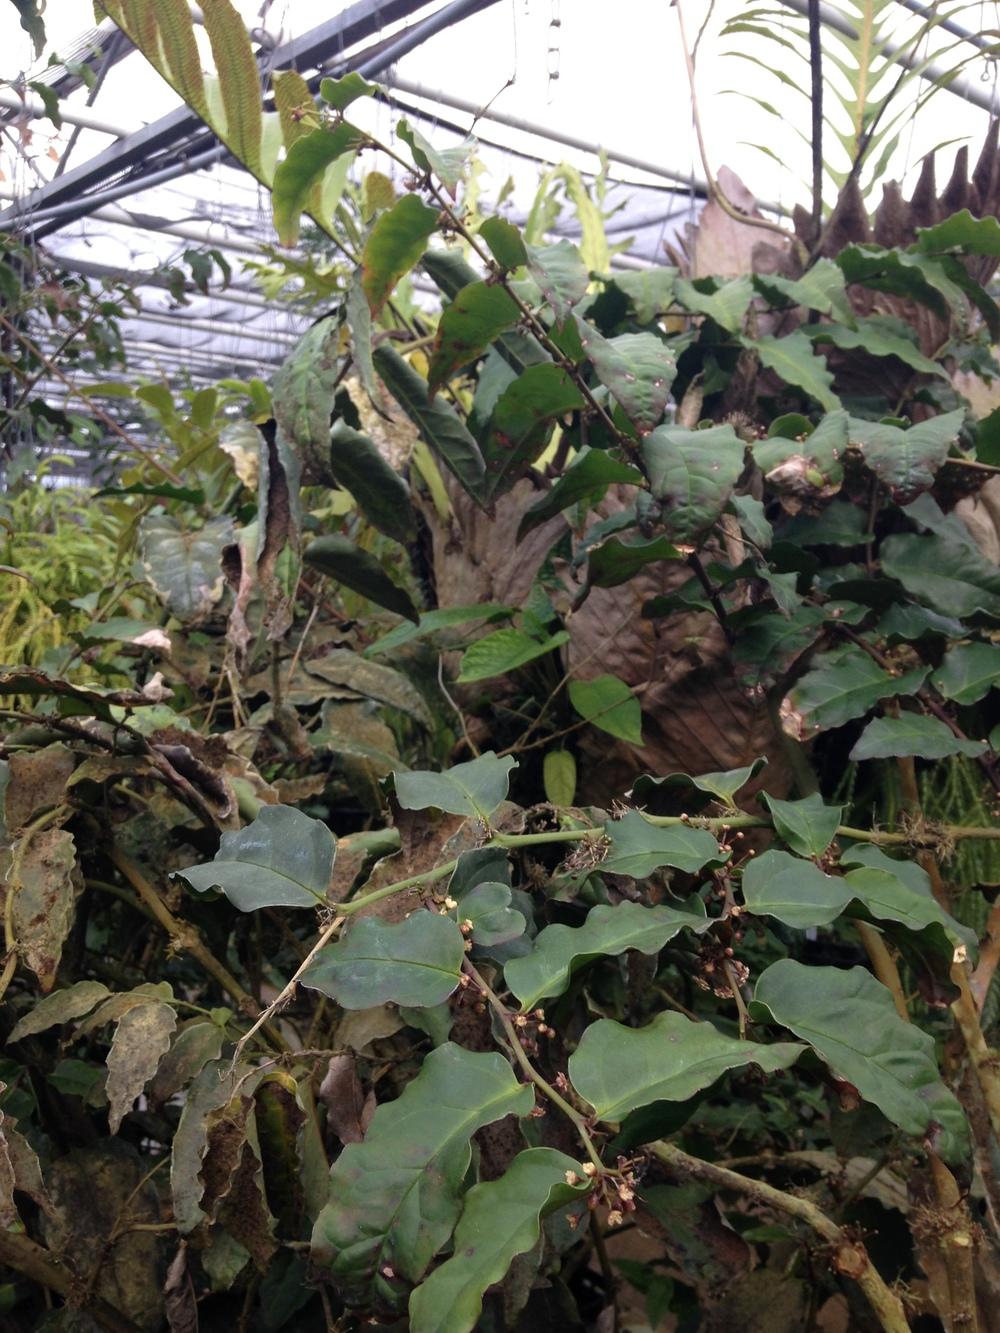 Meeting Amborella trichopoda — In Defense of Plants